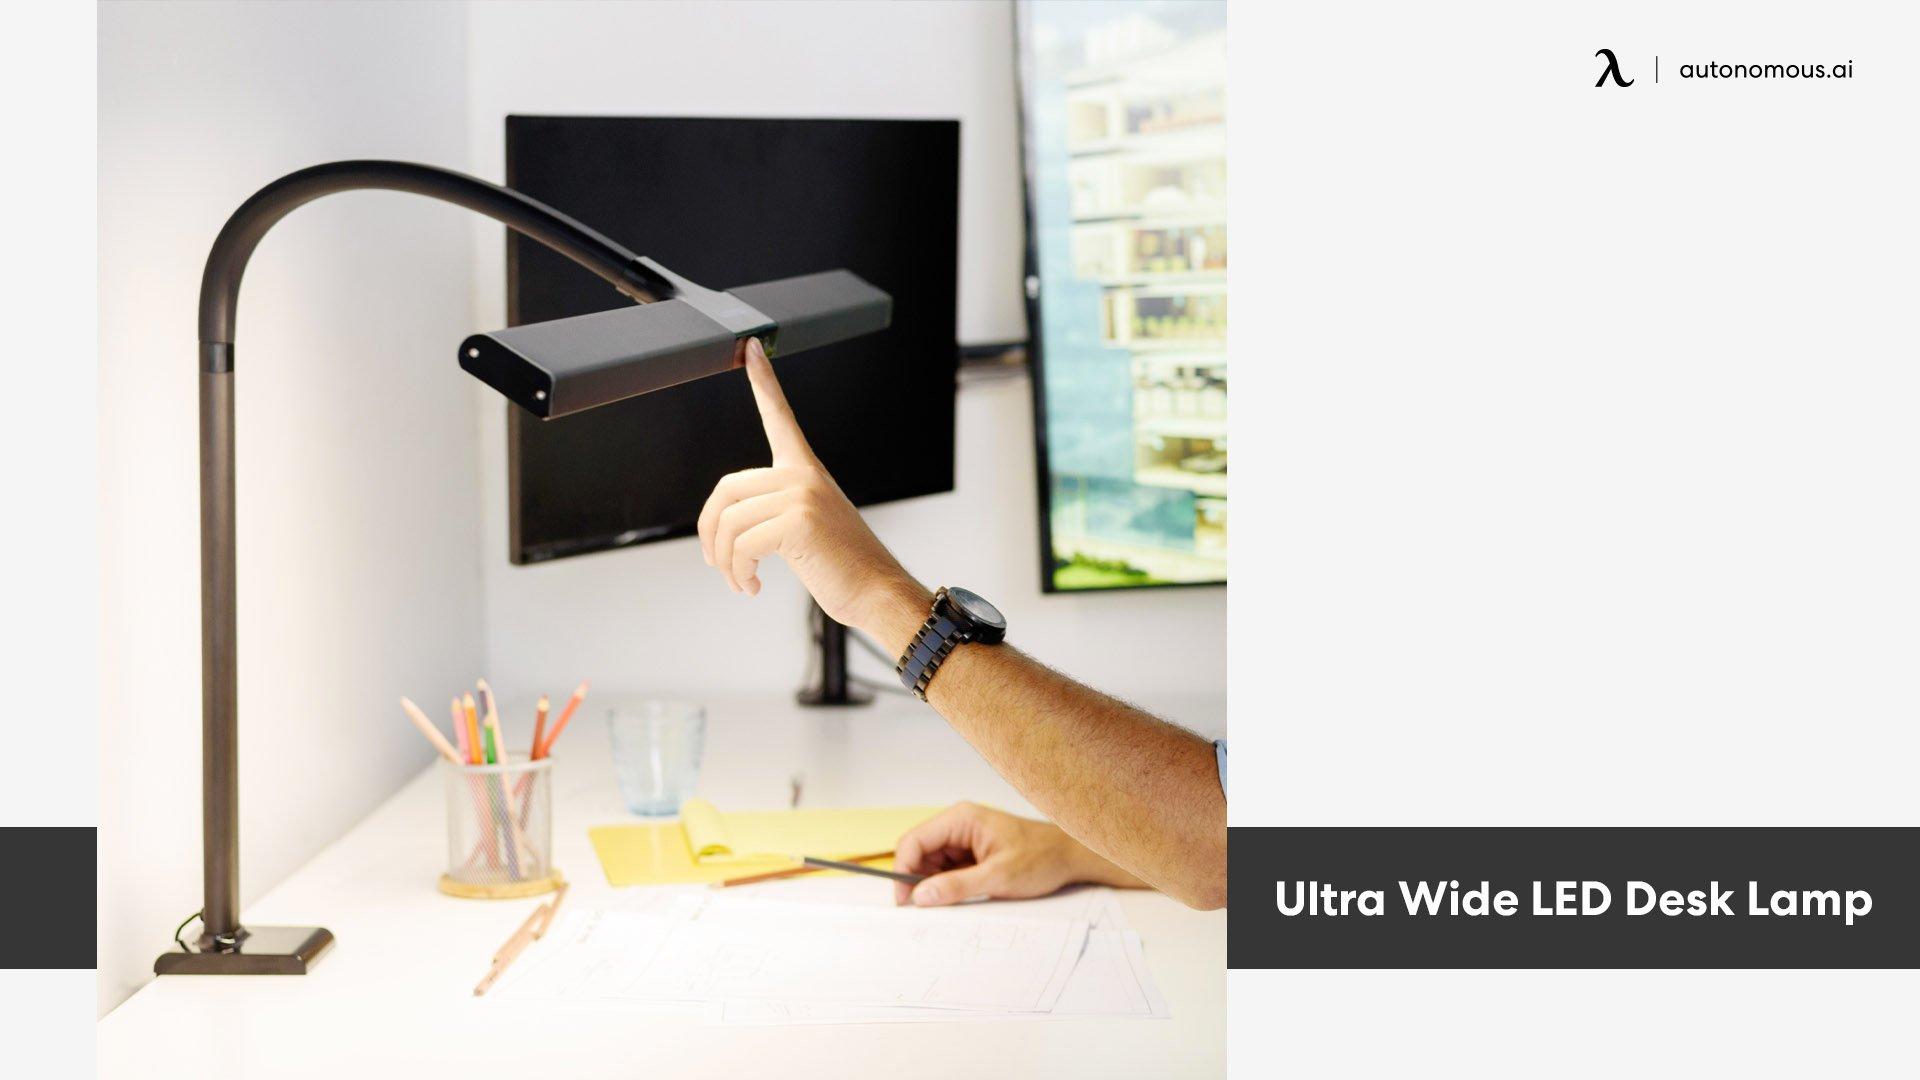 Photo of Ultra Wide LED Desk Lamp